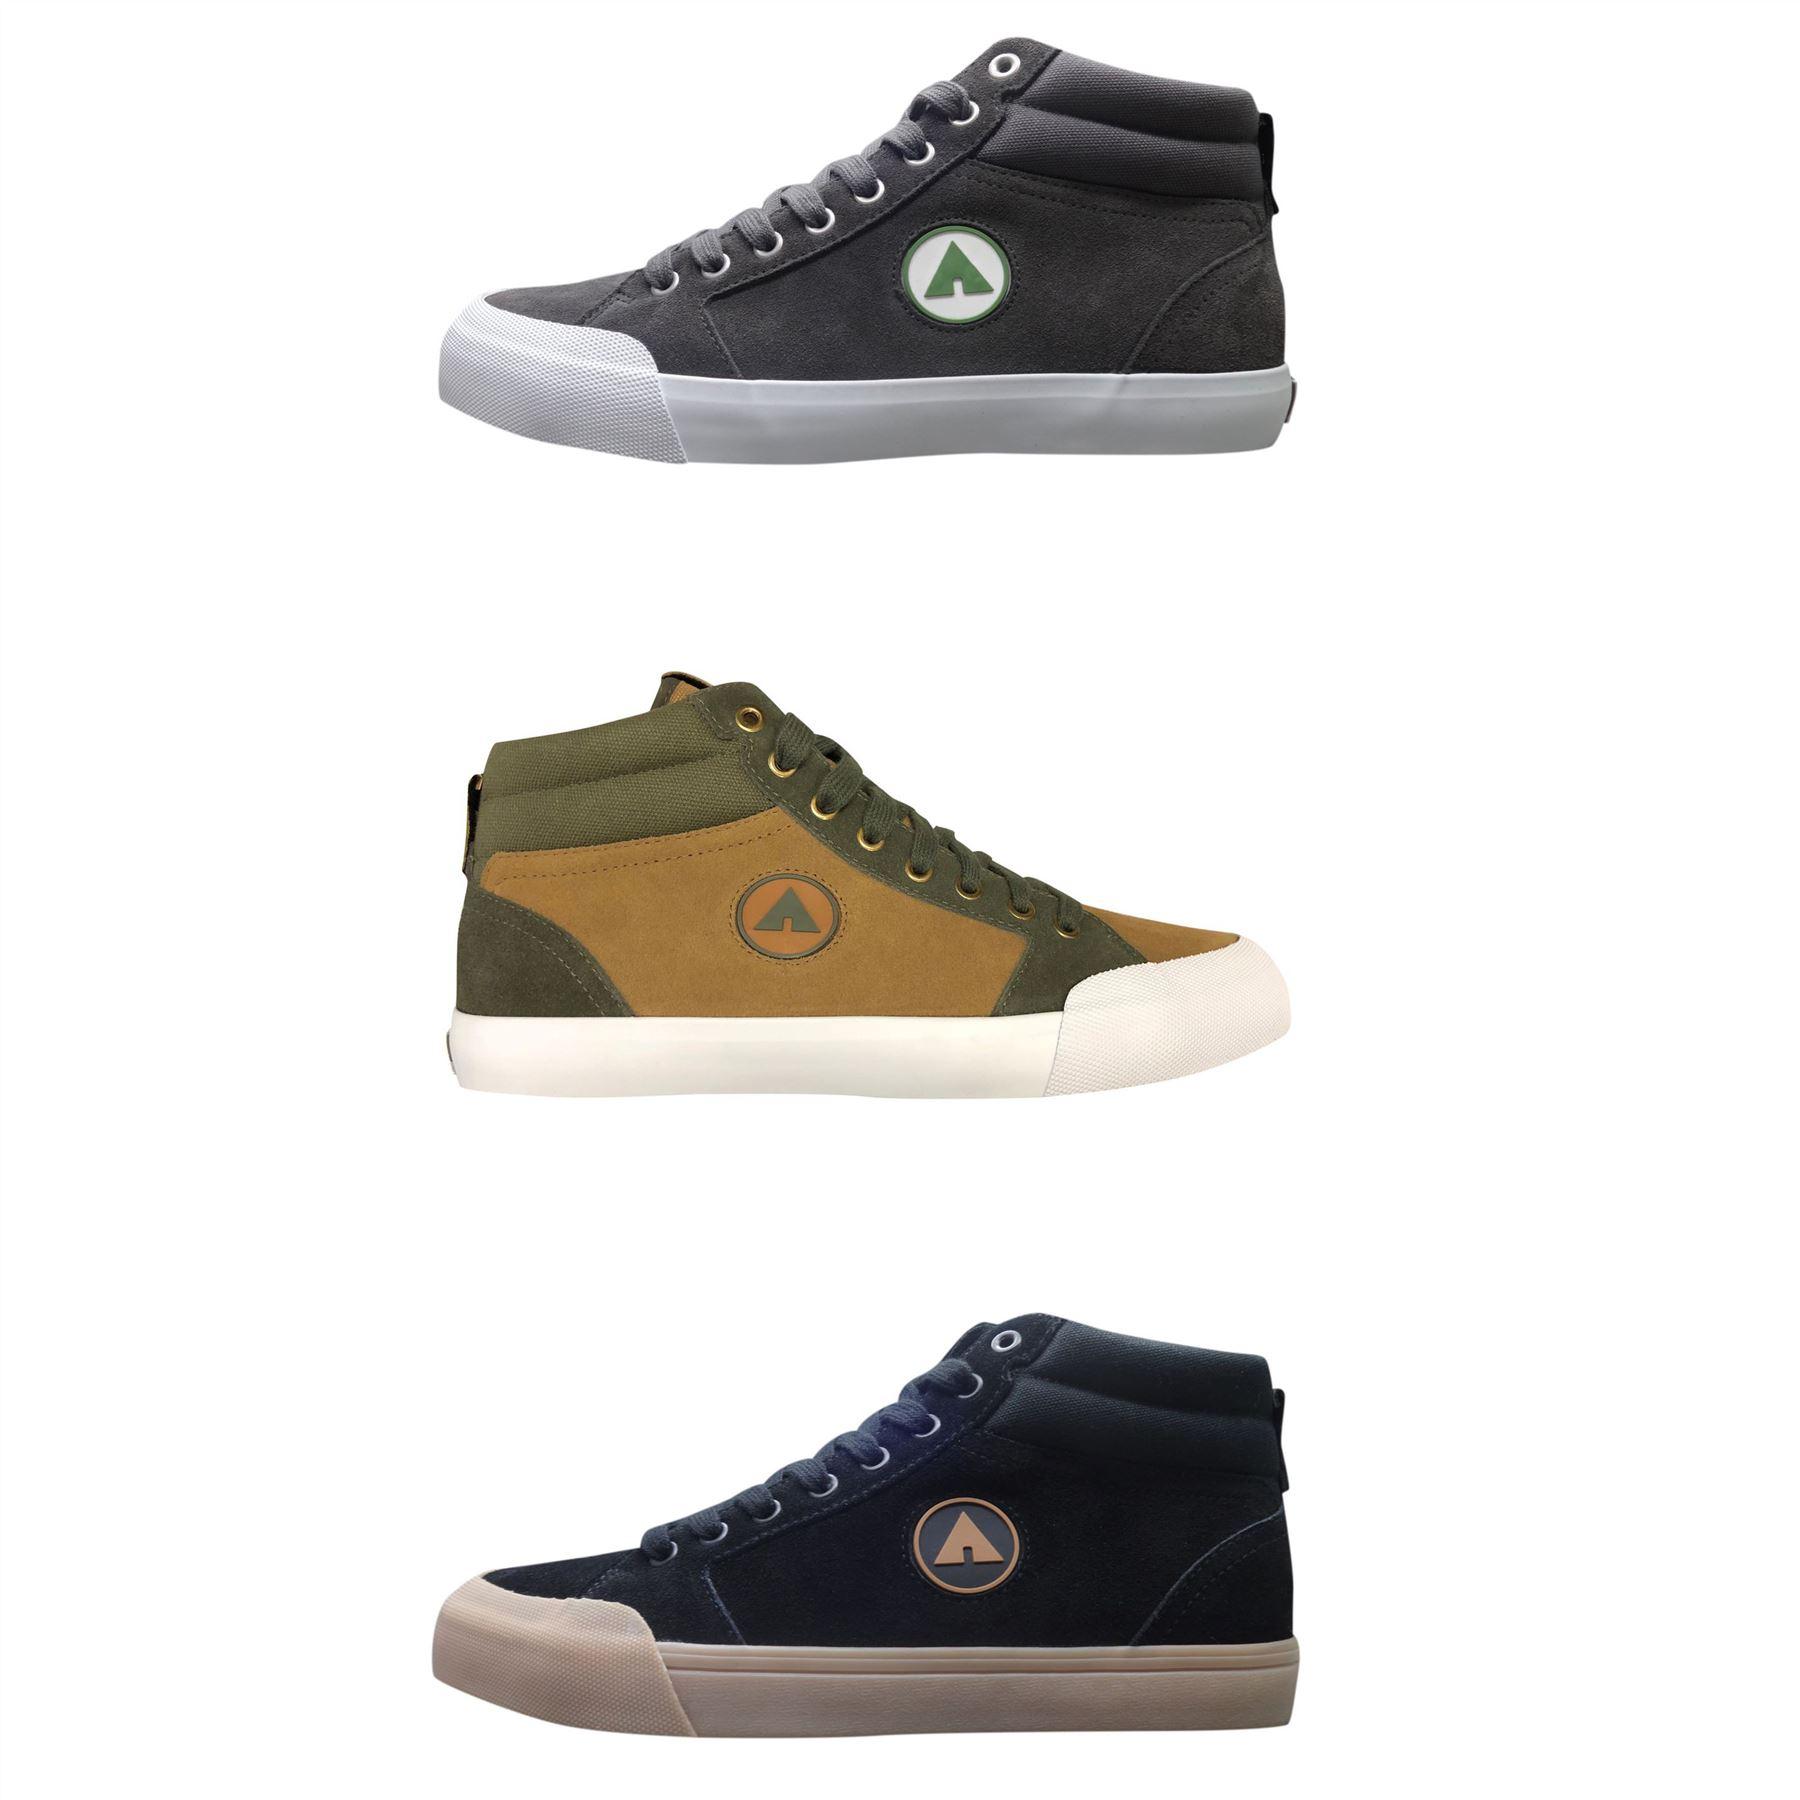 wholesale online in stock newest Details about Airwalk Pivot Mid Top Trainers Mens Skateboarding Footwear